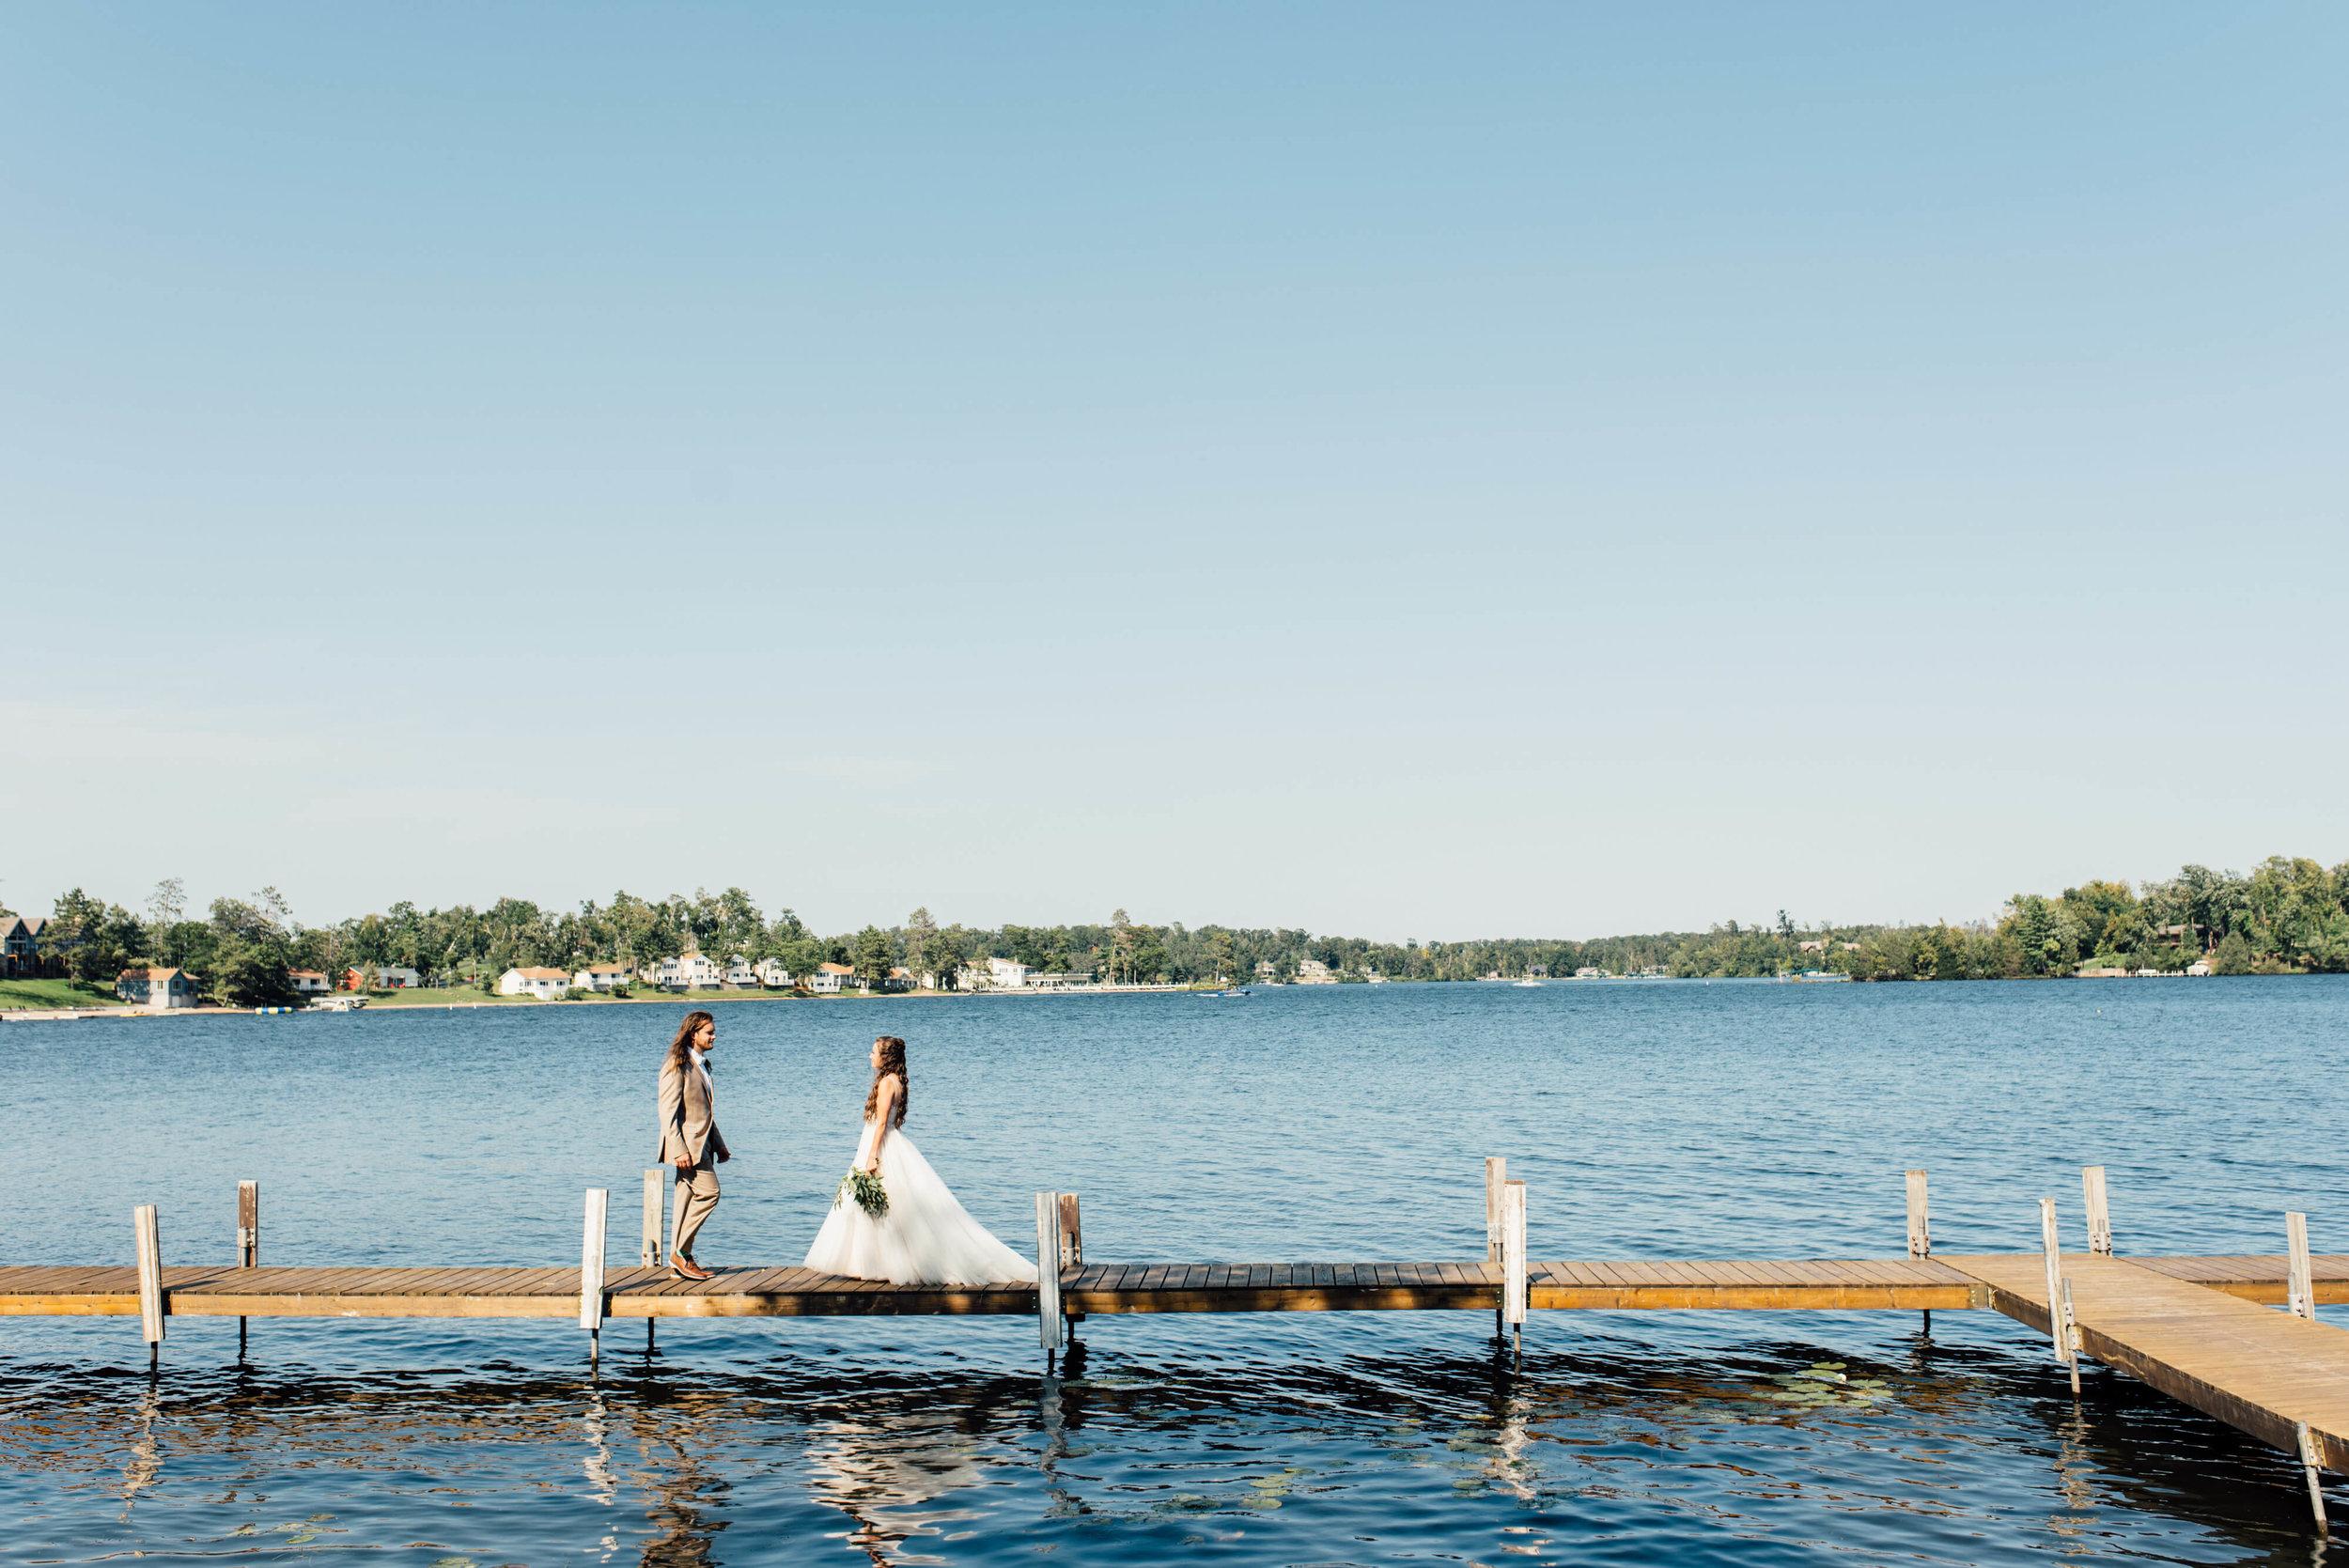 engle-olson-wedding-blair-taylor-22.1.jpg